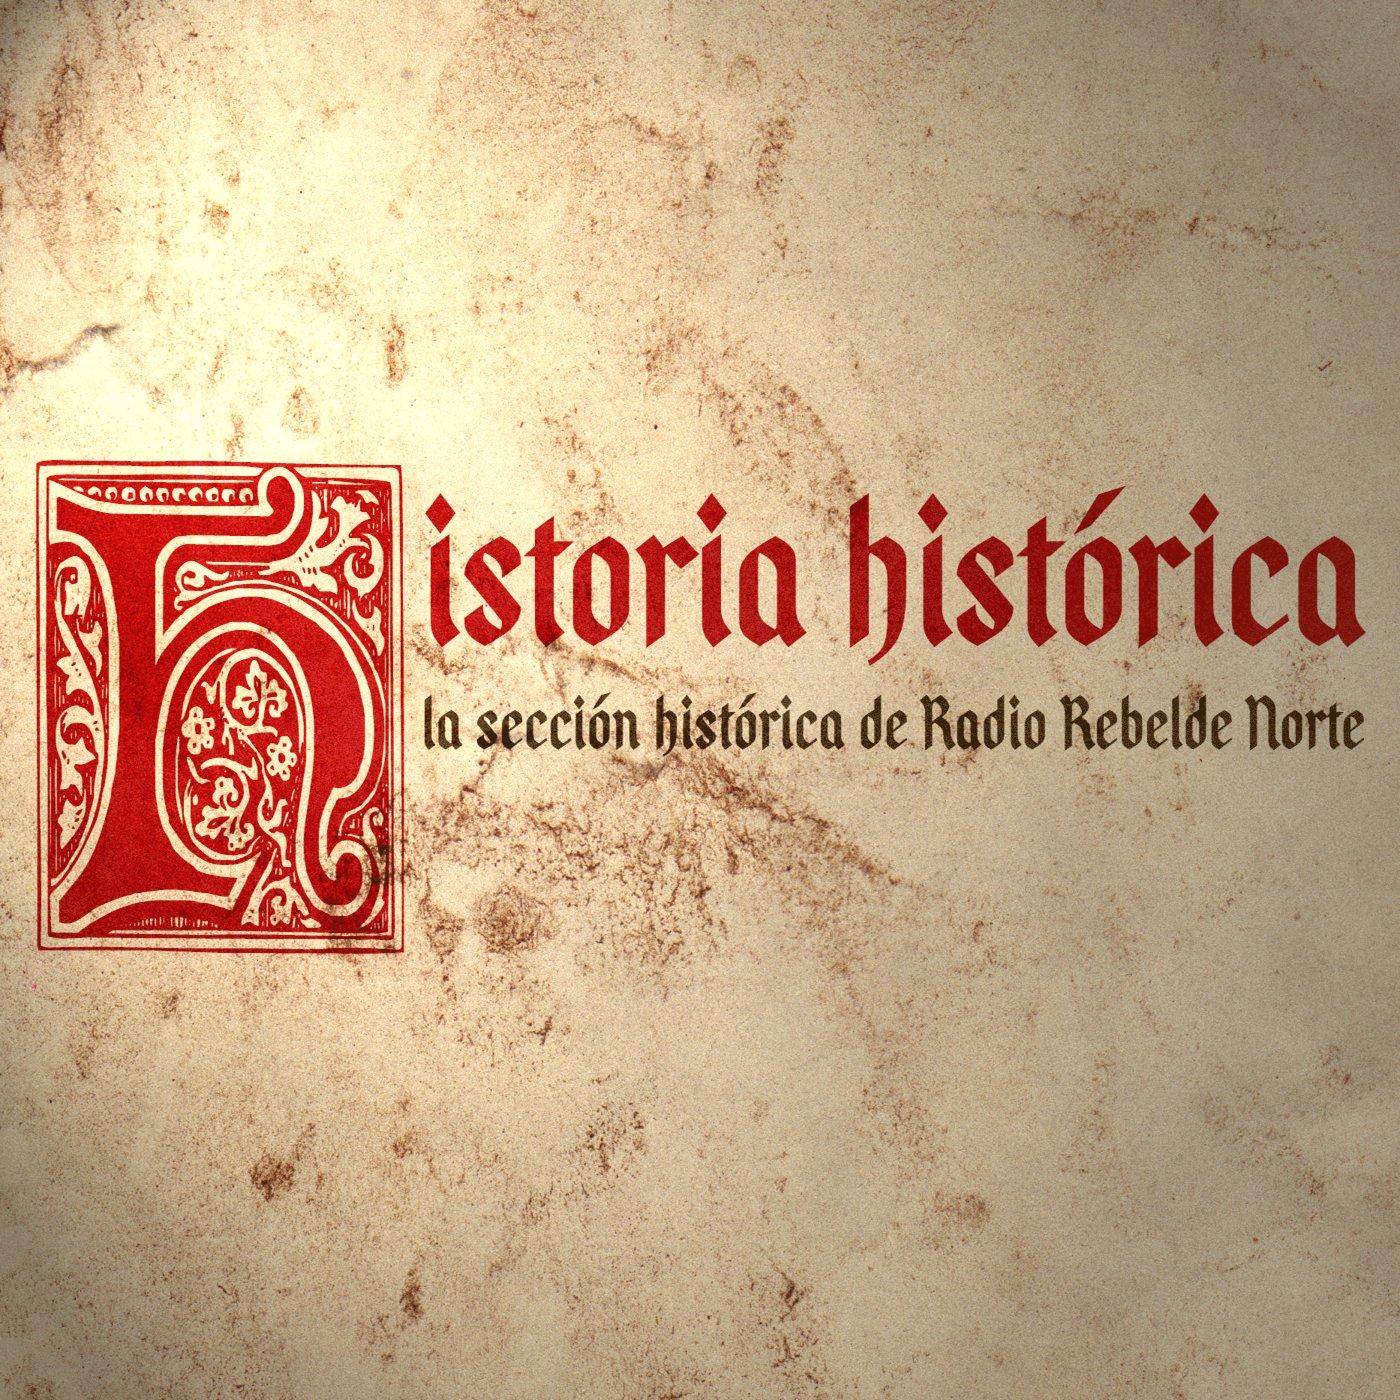 <![CDATA[Historia histórica]]>